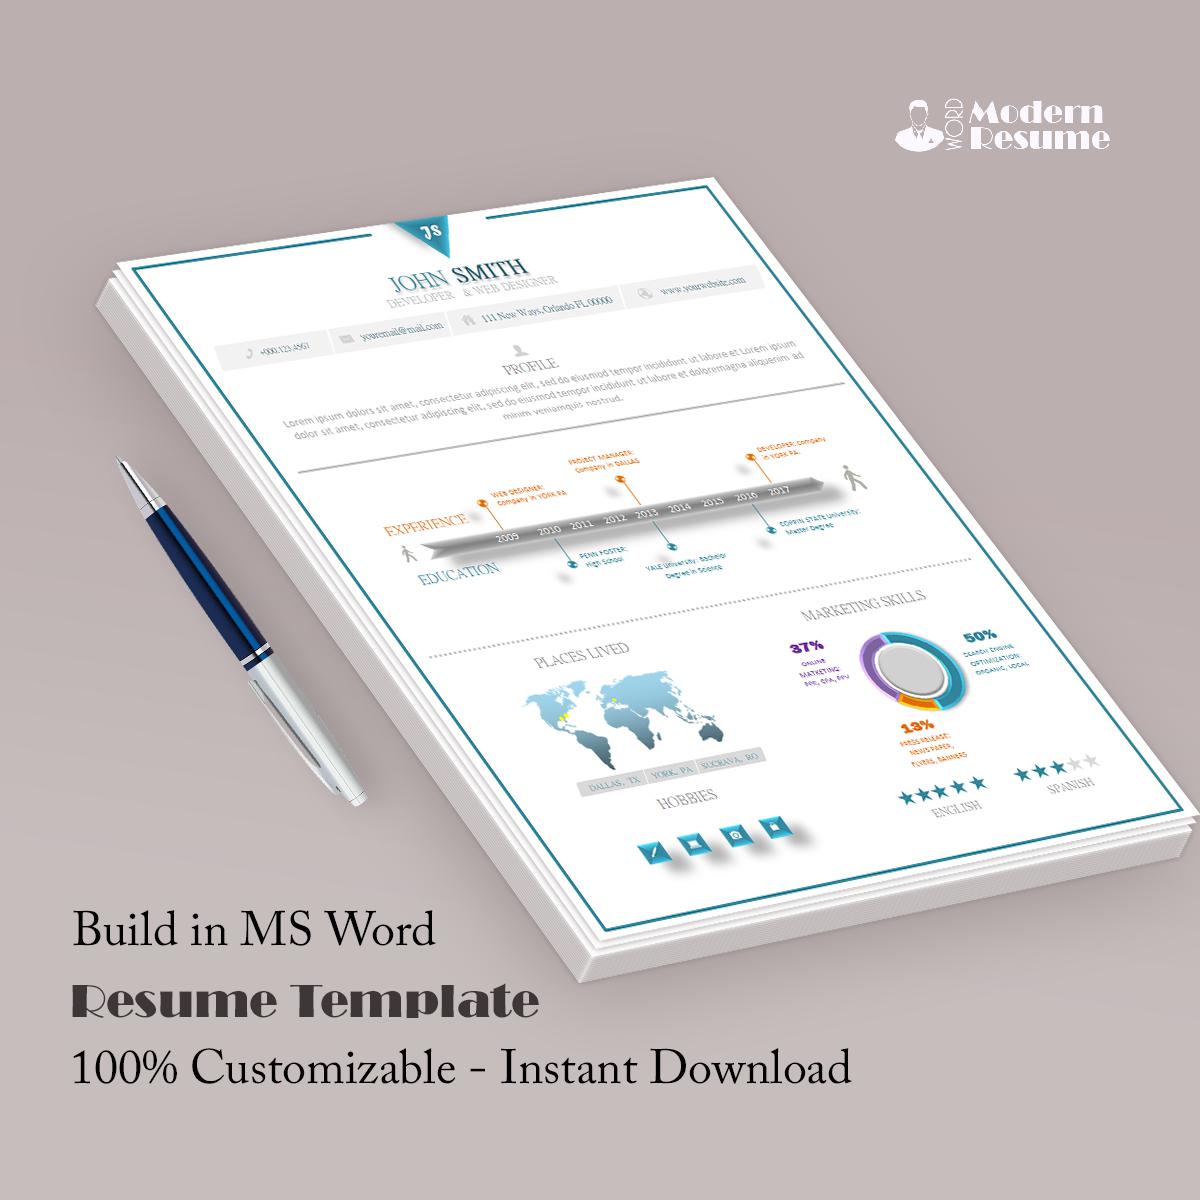 Path Resume Template 100% Customizable